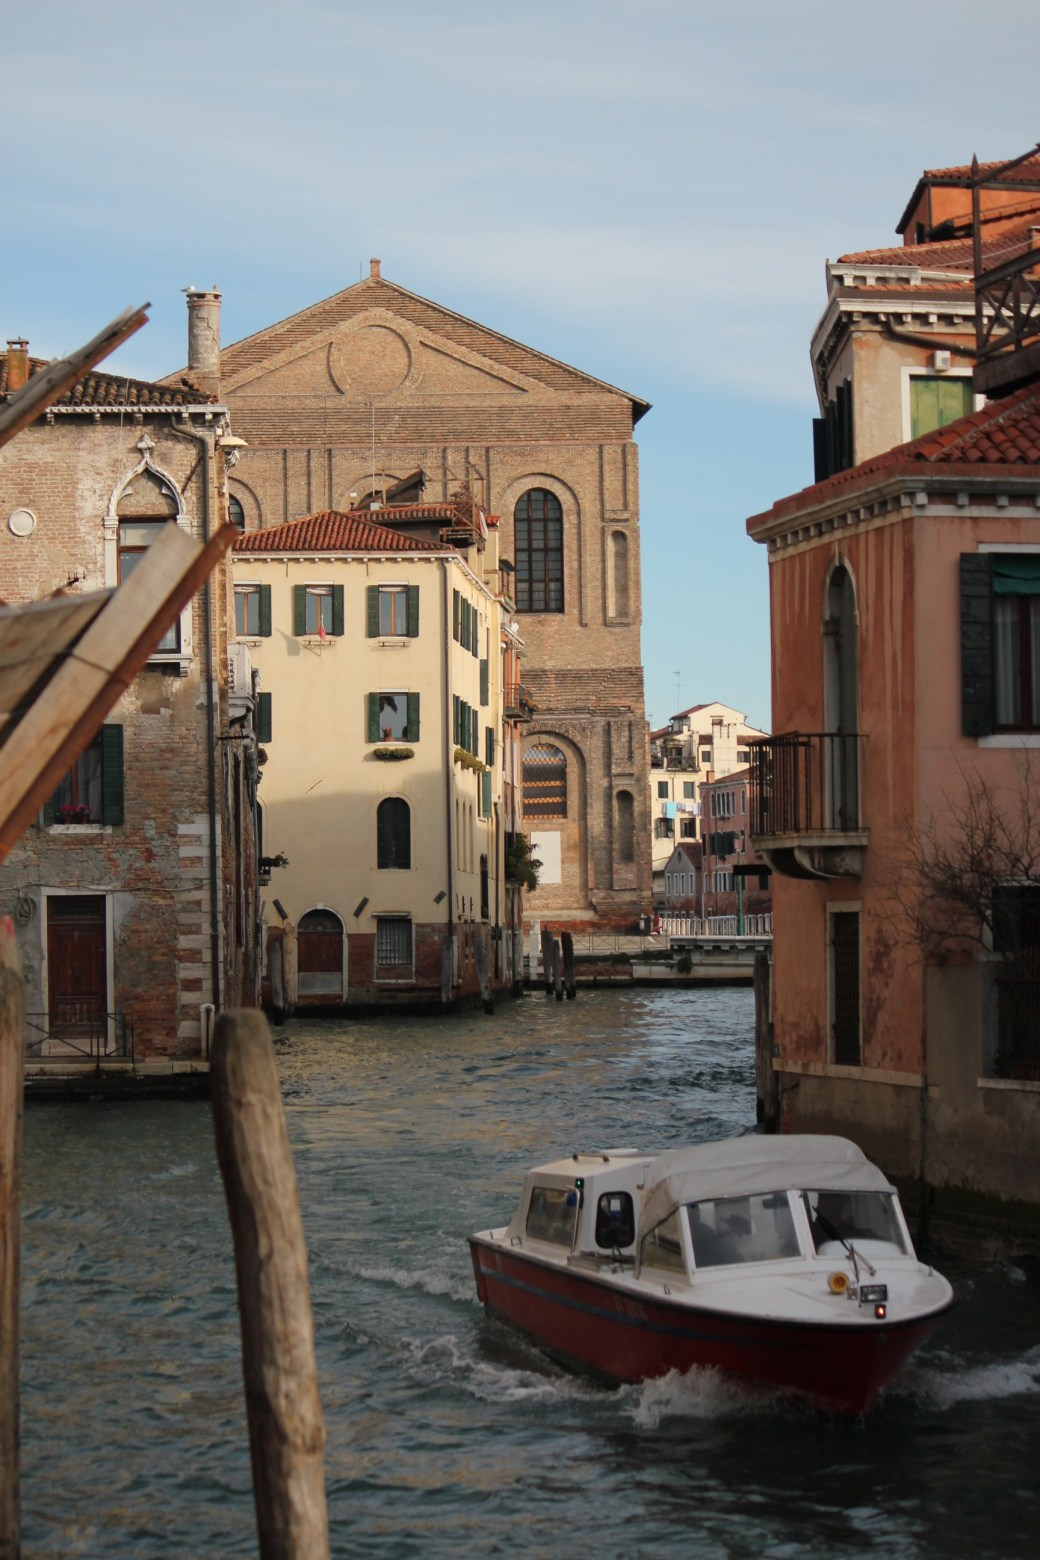 Boat Transport; Venice, Italy; 2011